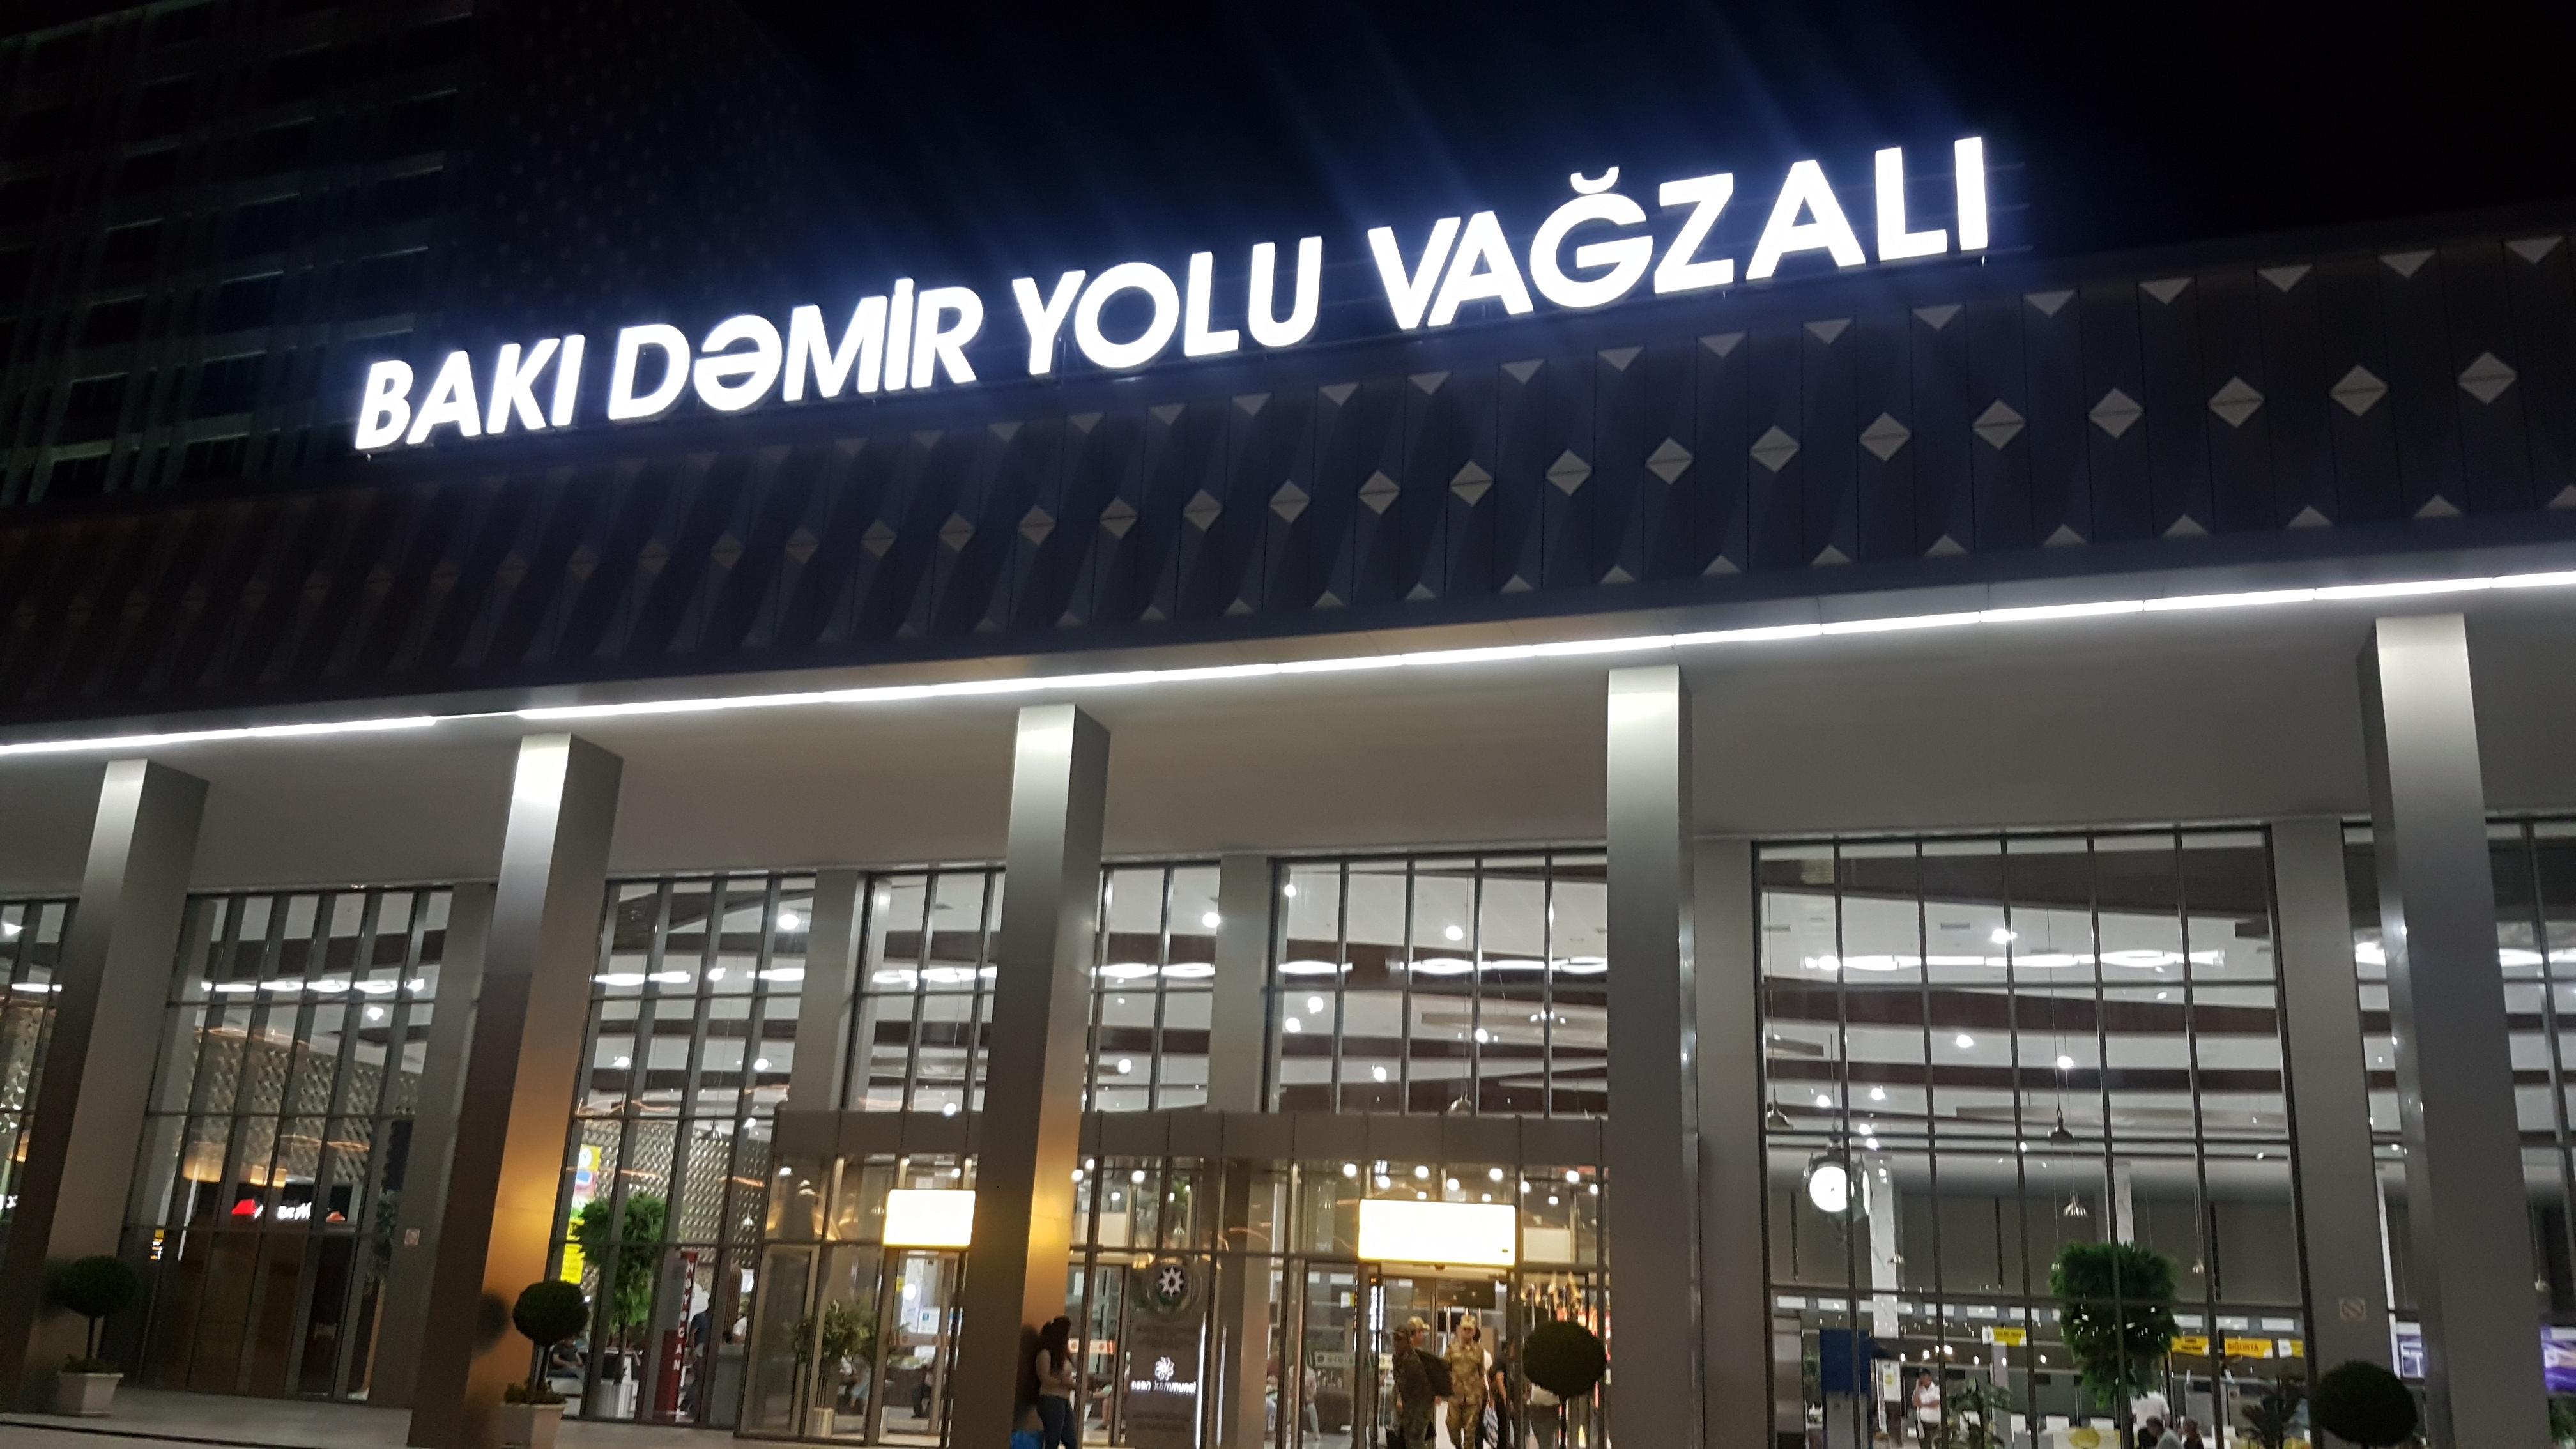 Baku Train Station at Night   How to Get From Baku to Georgia